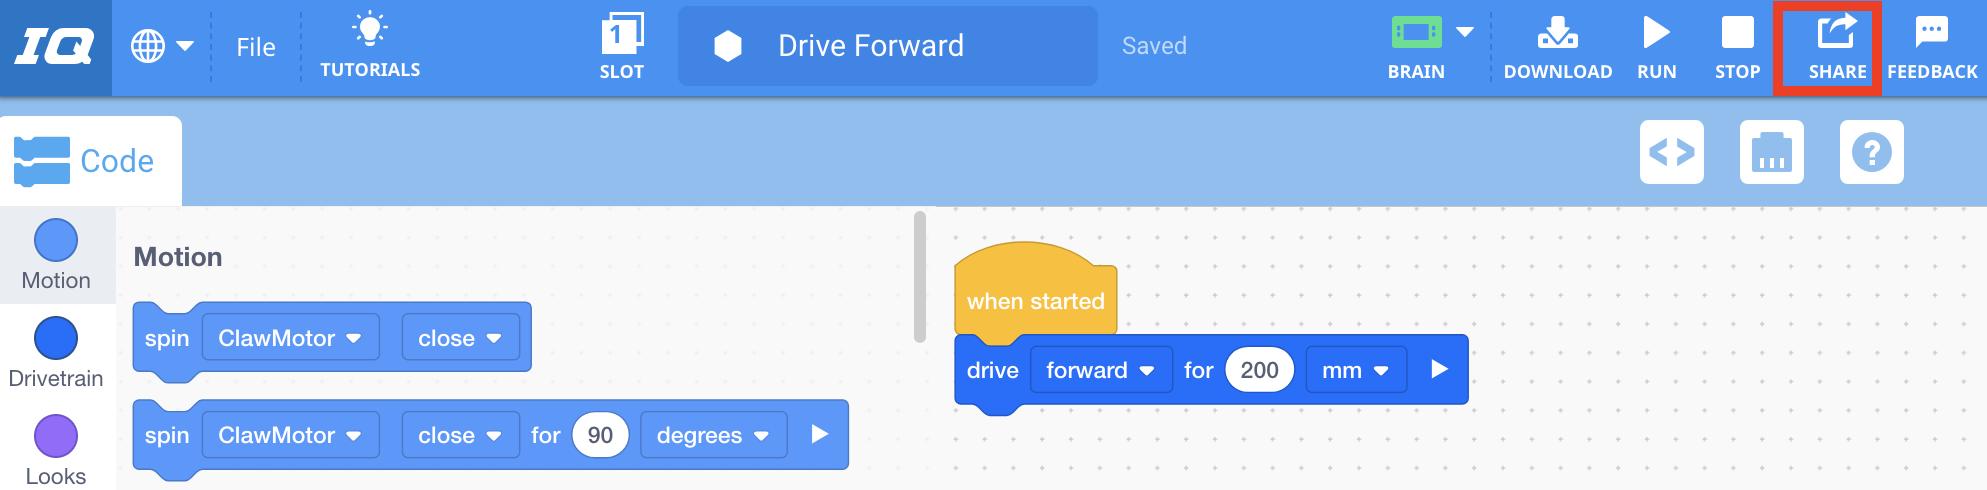 Drive_Forward_IQ.png